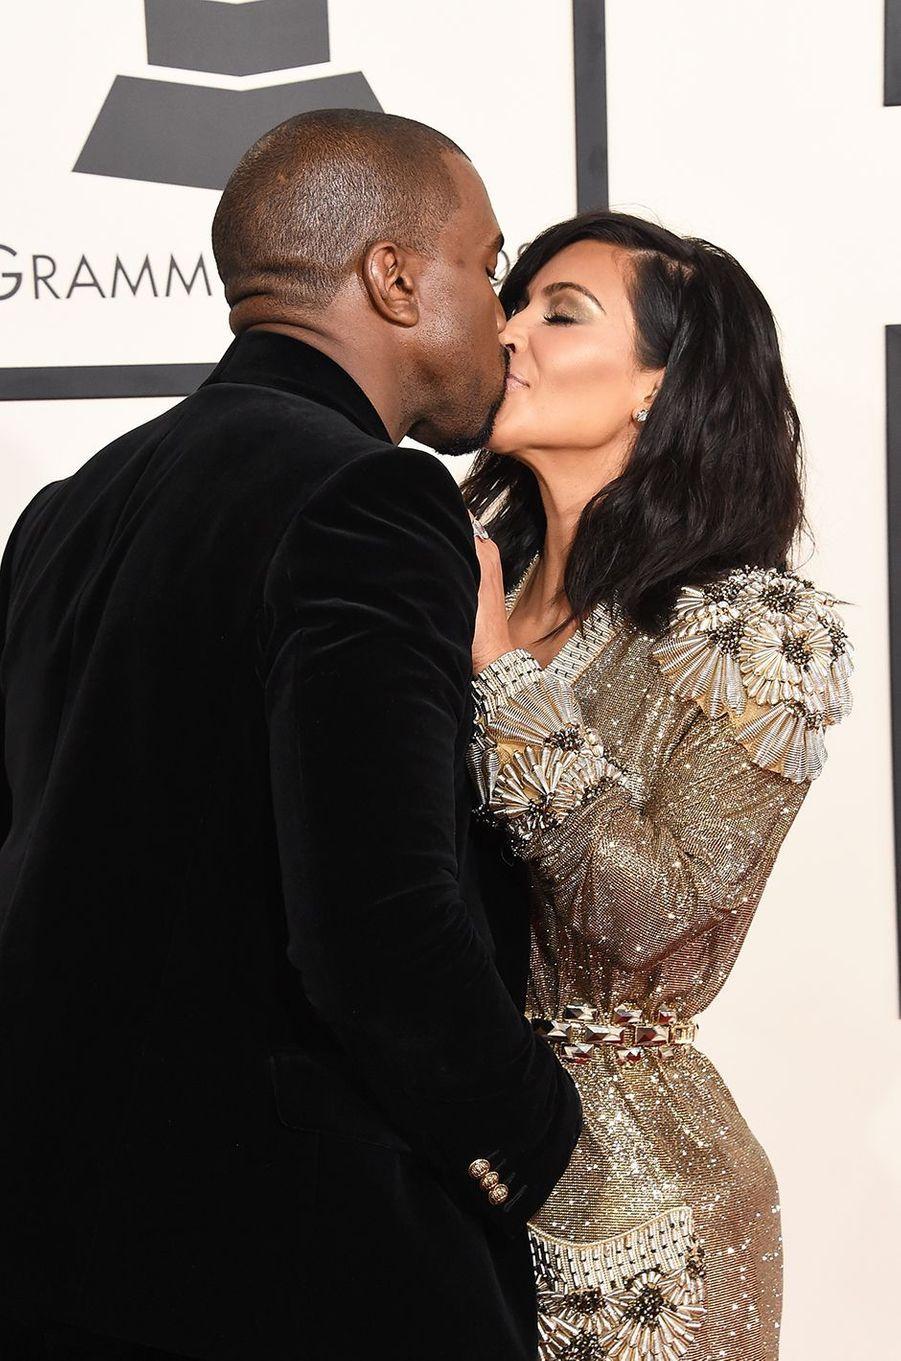 Kanye West et Kim Kardashian aux Grammy Awards à Los Angeles en février 2015